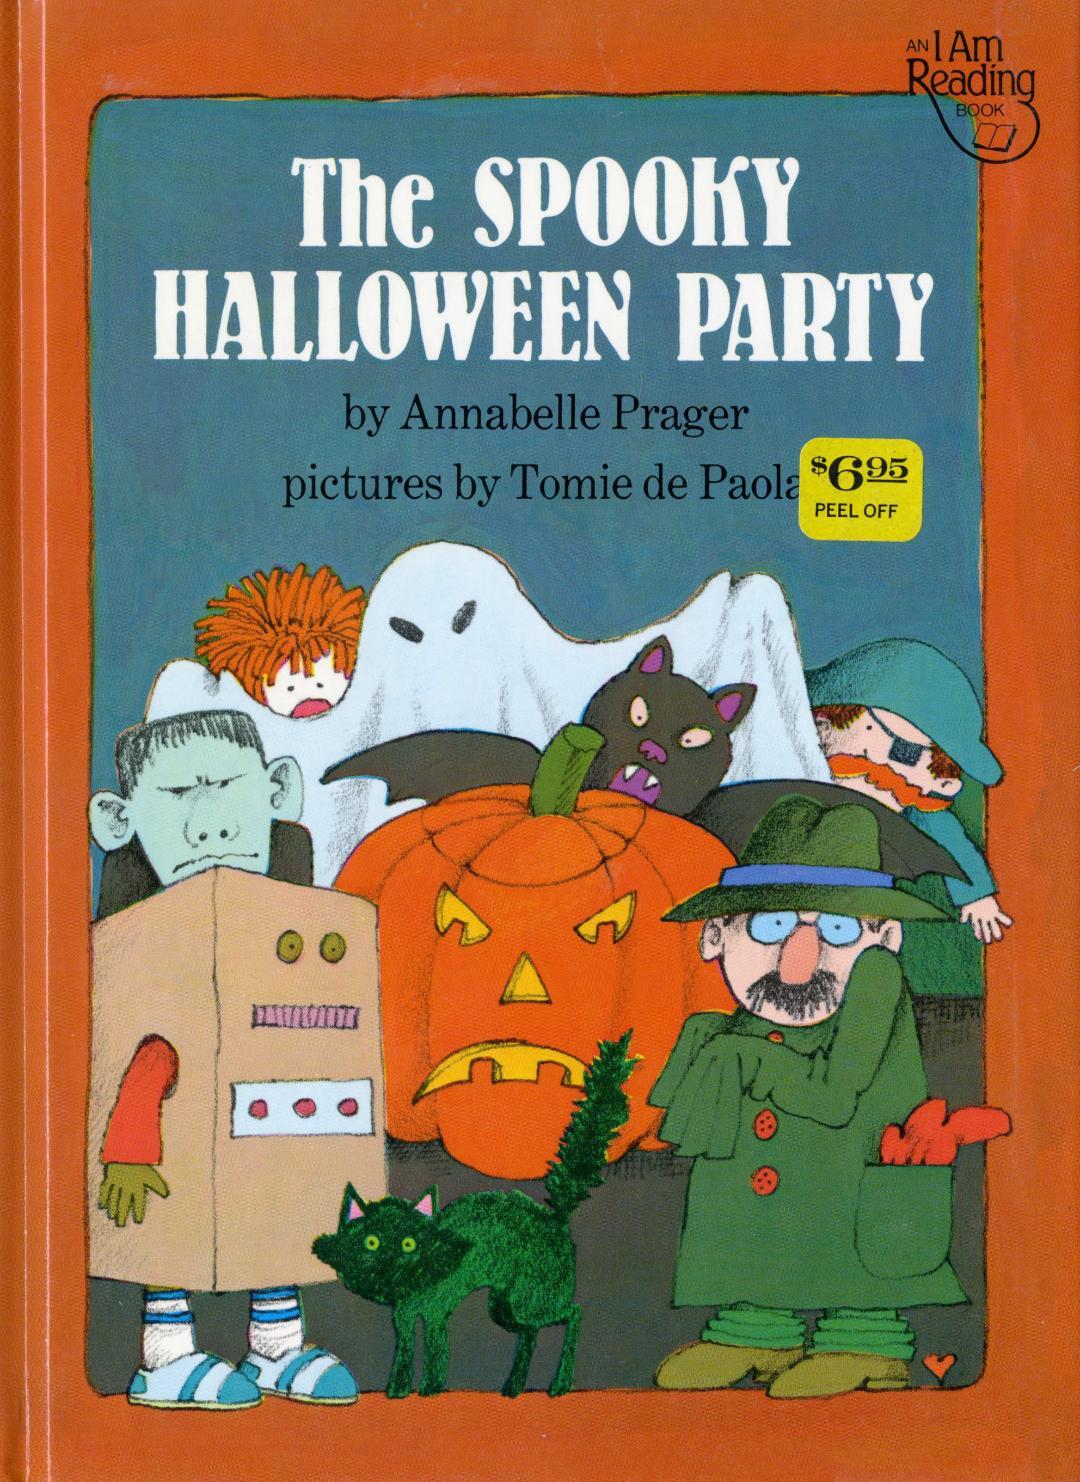 Spooky Halloween Party, The HC.jpg